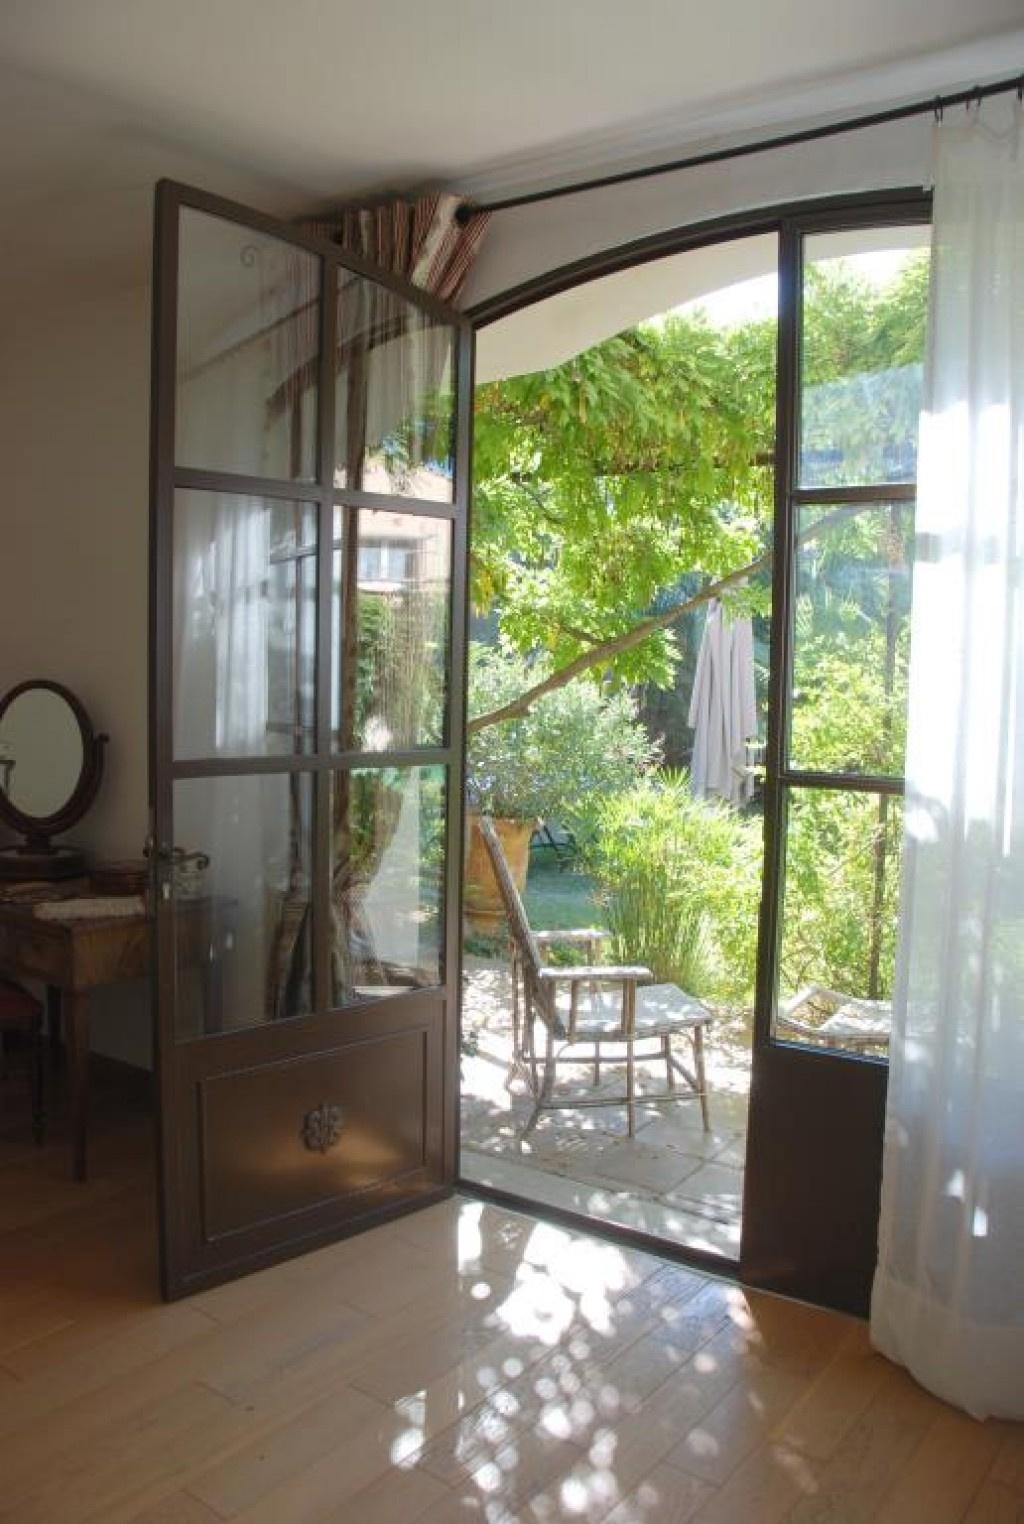 maison bourgroise jardin village Gard agence Corinne Ponce Nimes (34)